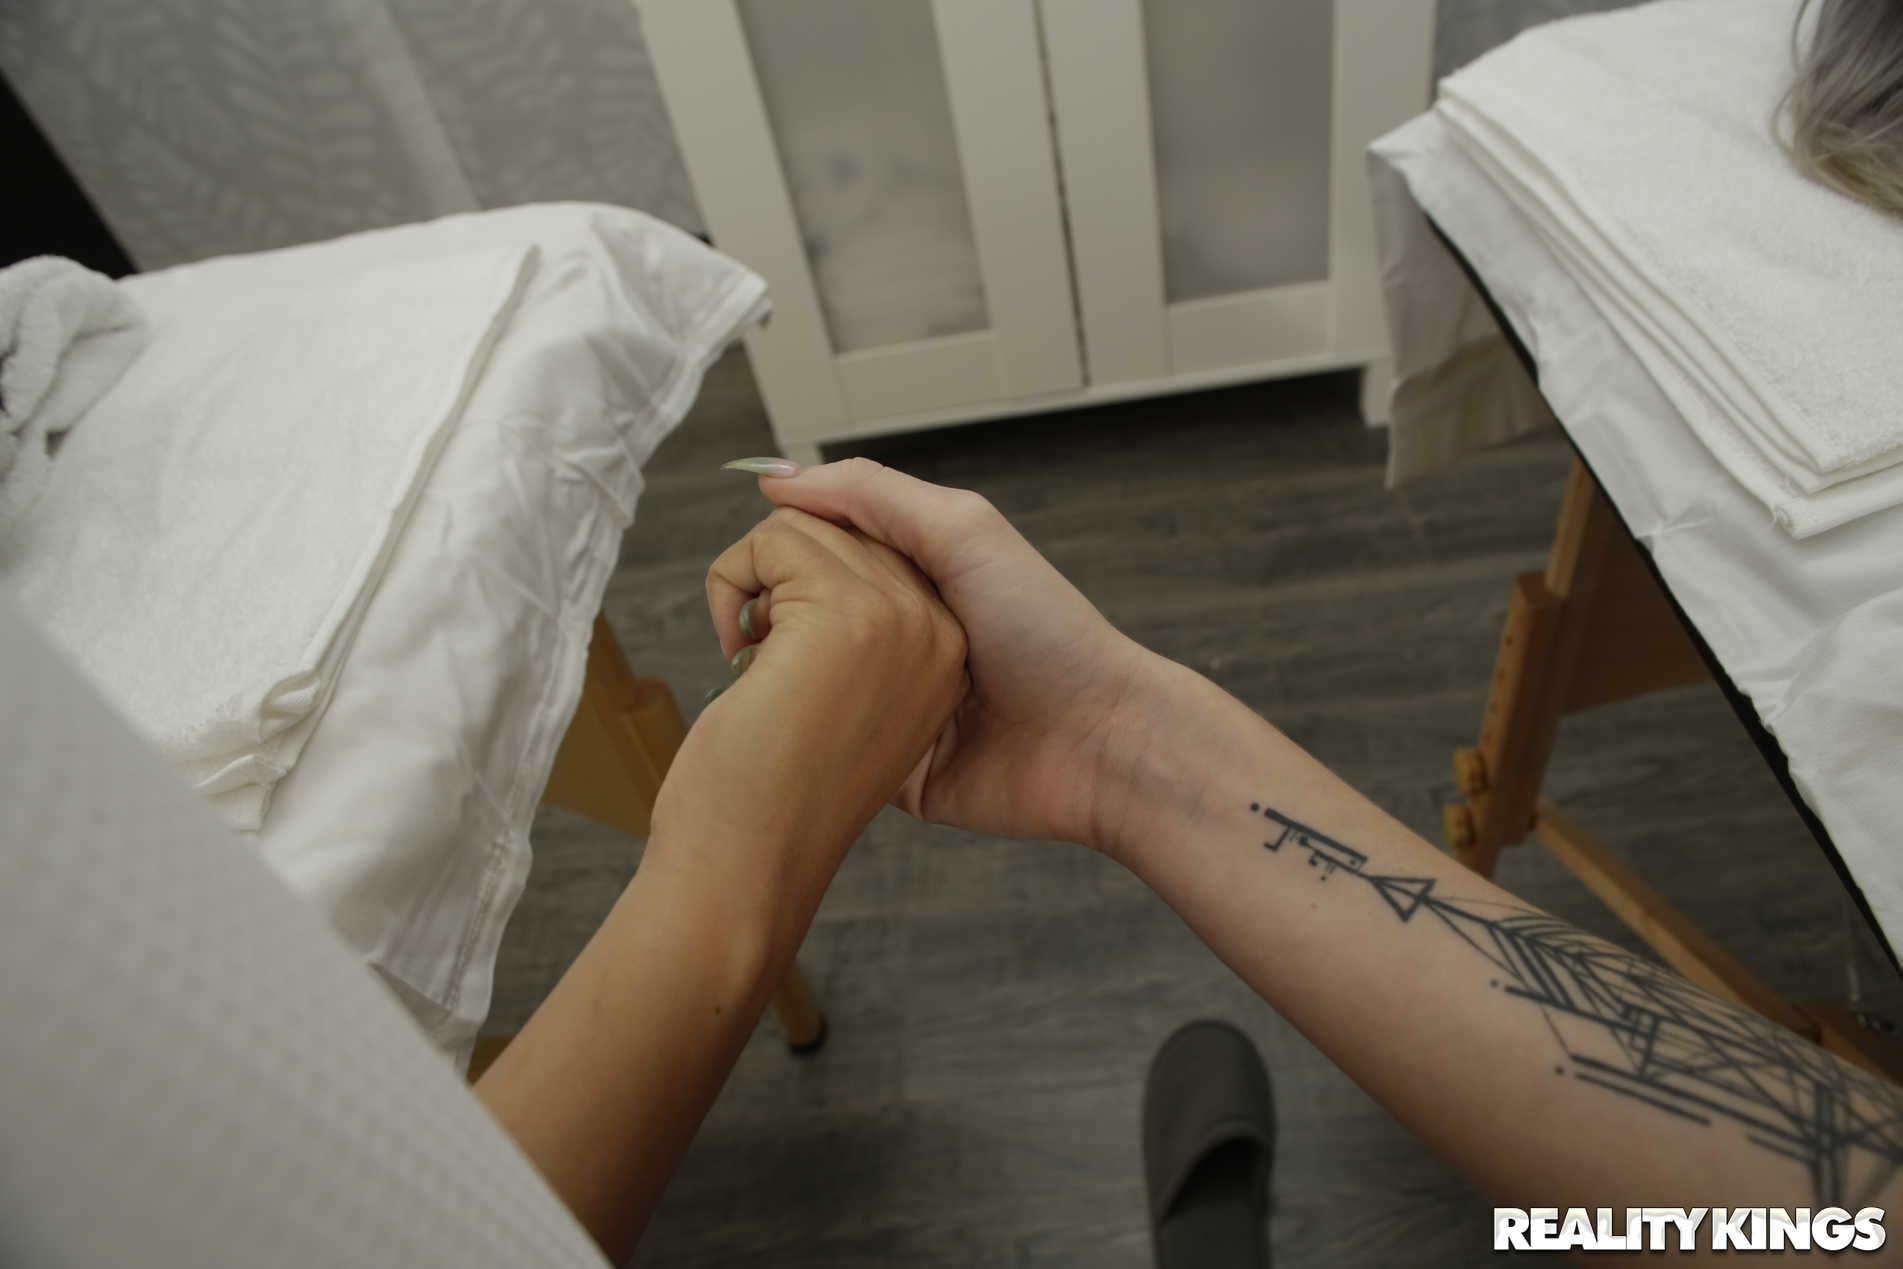 Reality Kings 'Sapphic Spa Day' starring Jynx Maze (Photo 168)